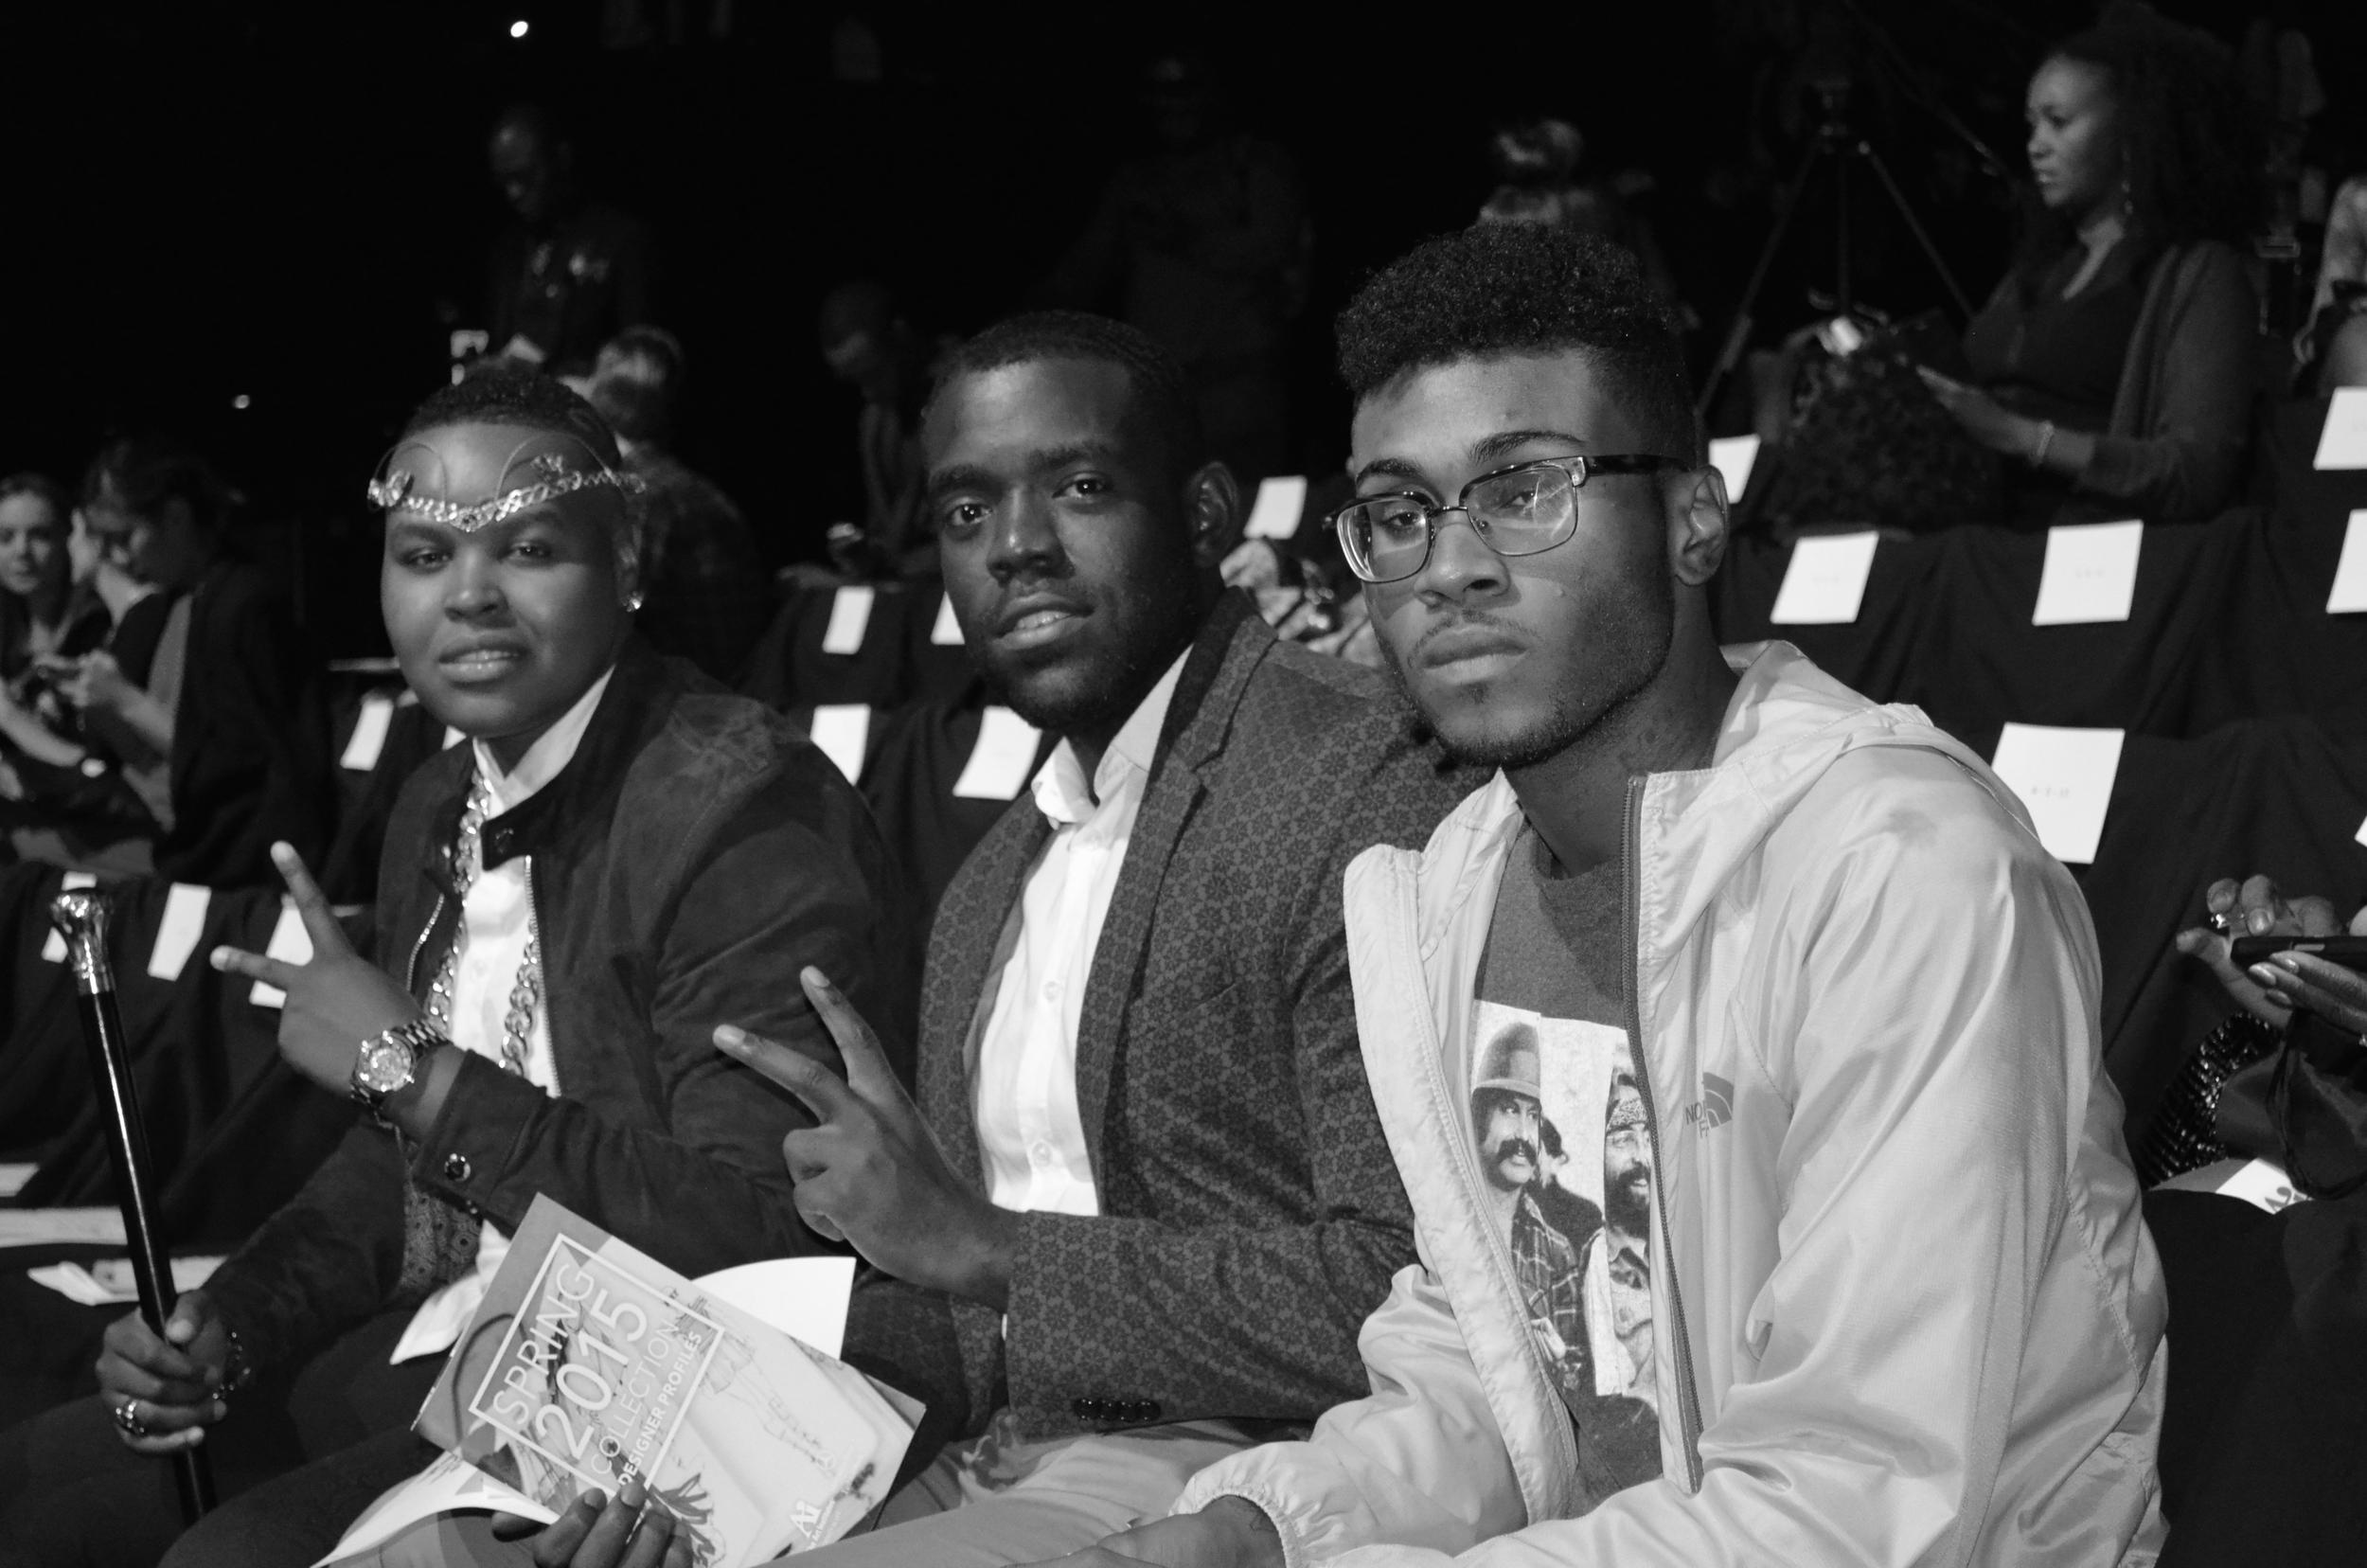 Three men, three styles at Lincoln Center - New York Fashion Week.